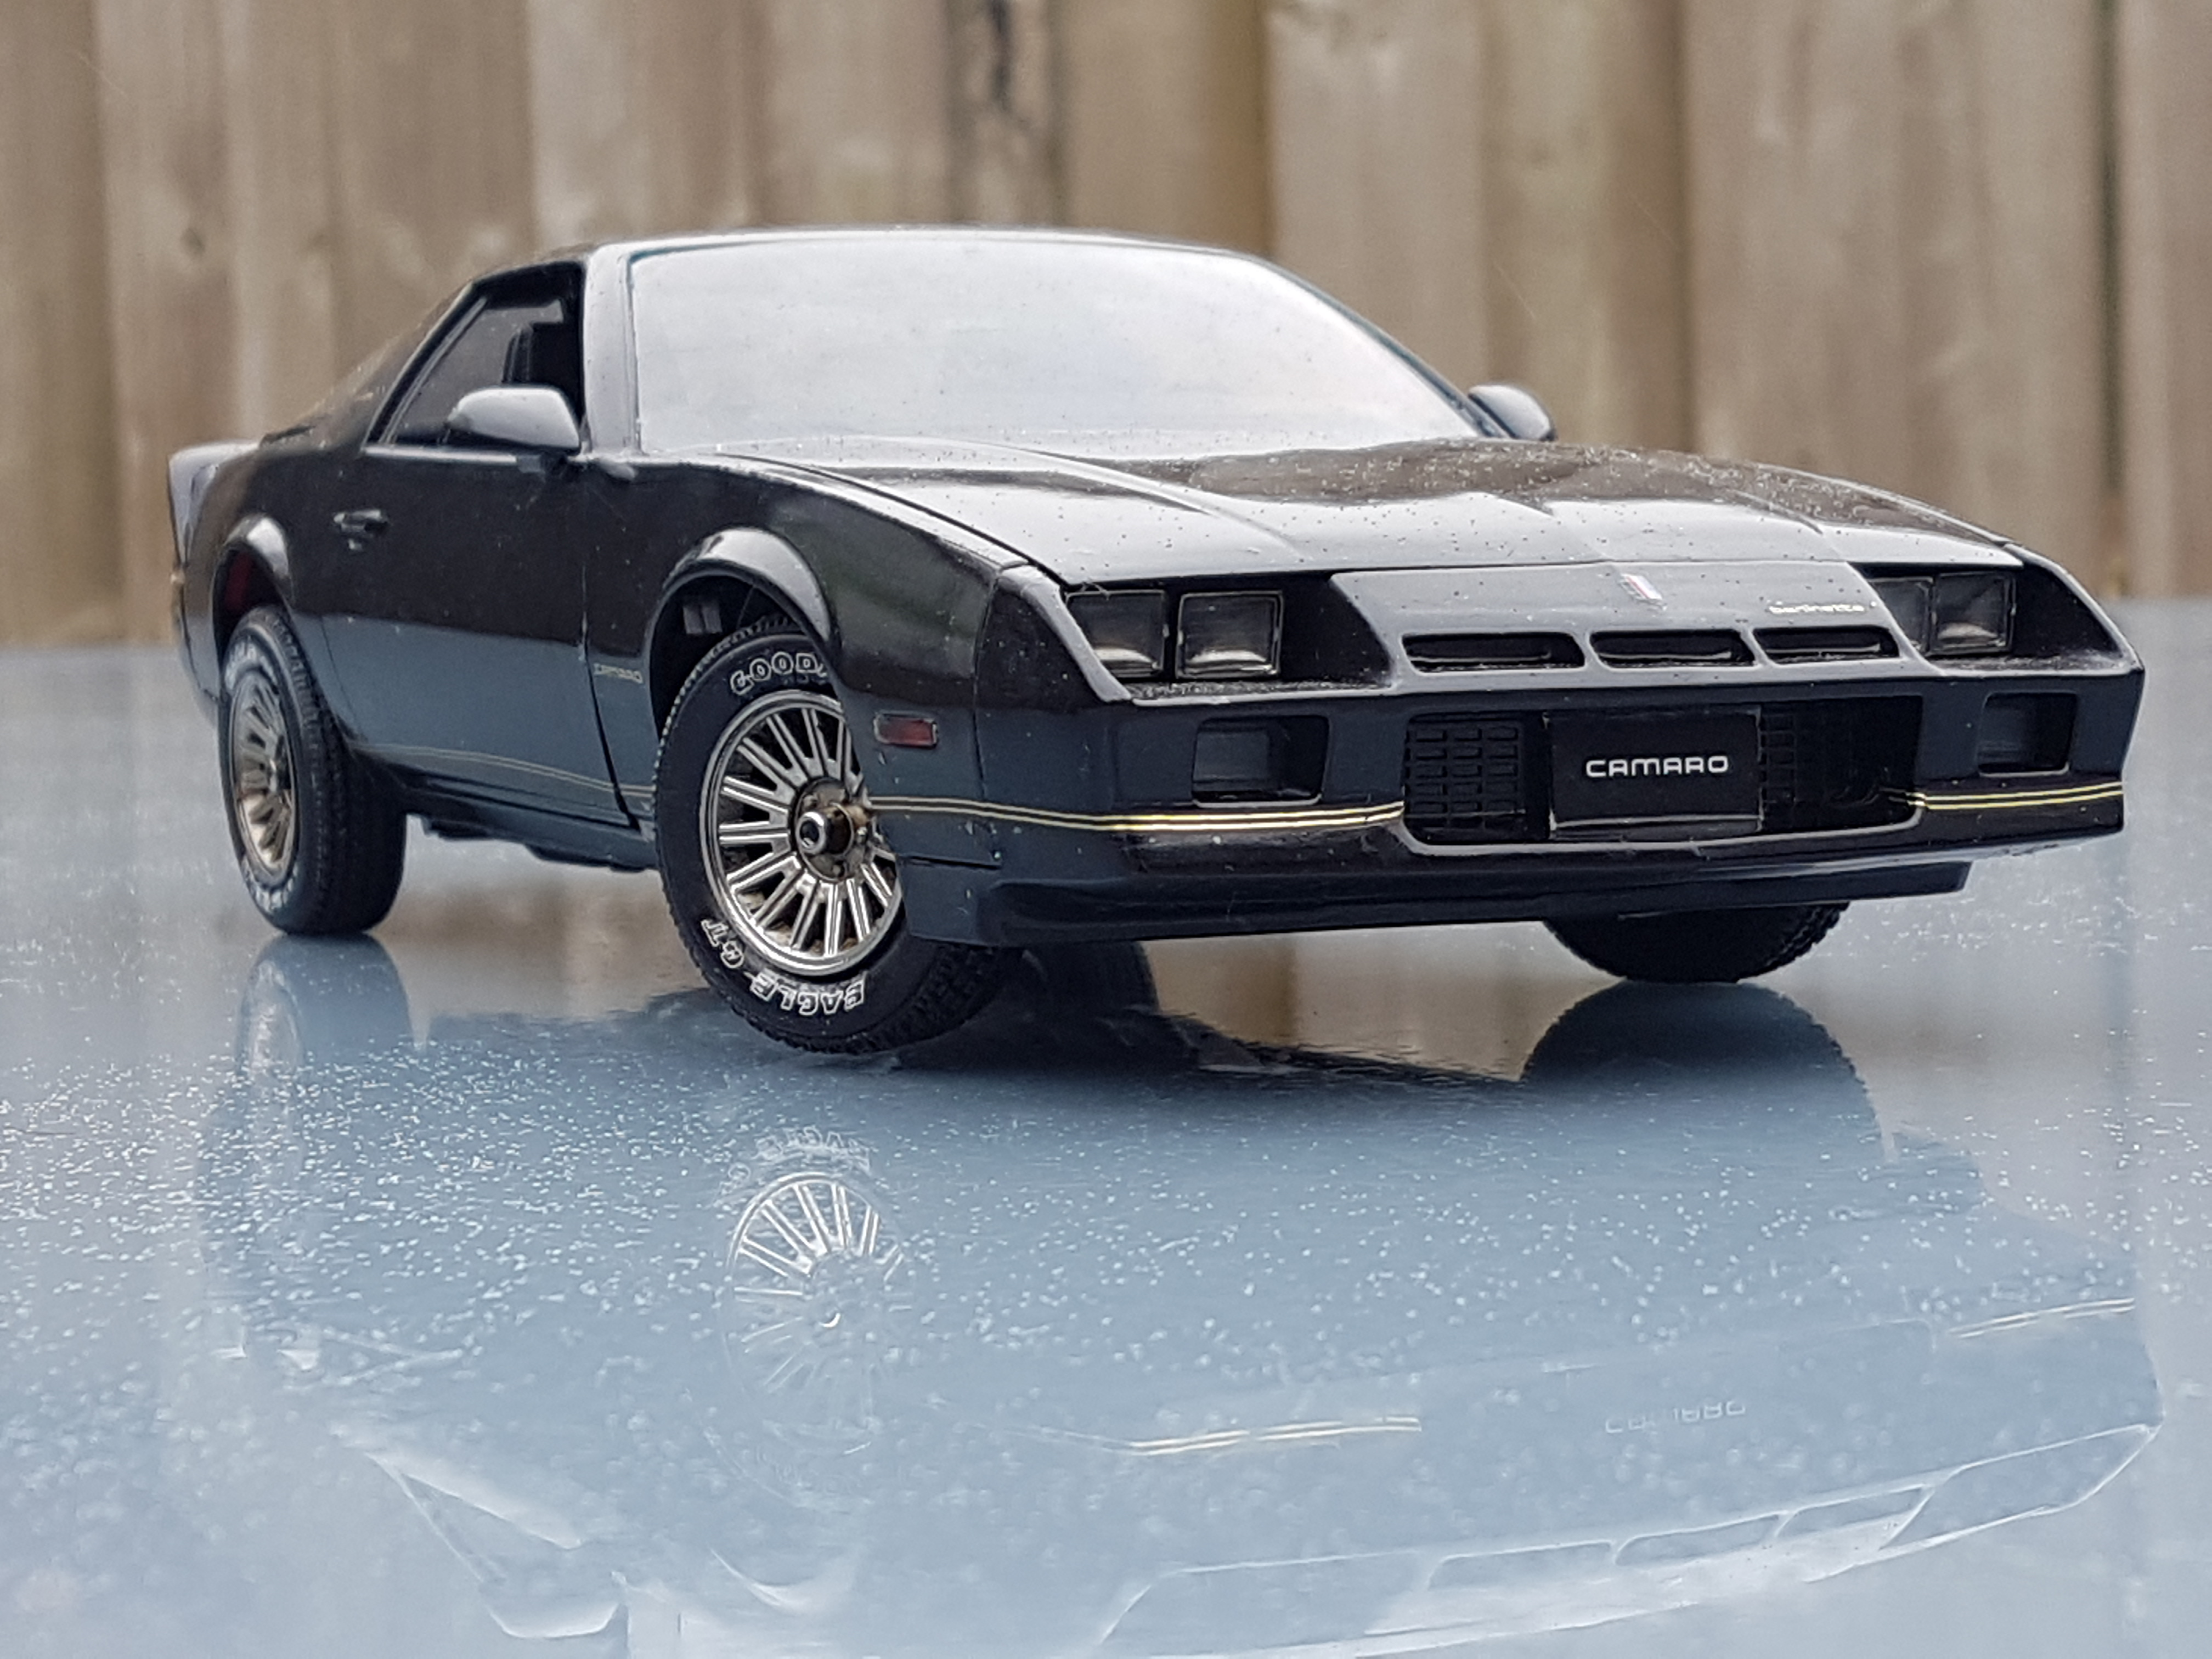 1983 Chevrolet Camaro Berlinetta Revell Rays Kits